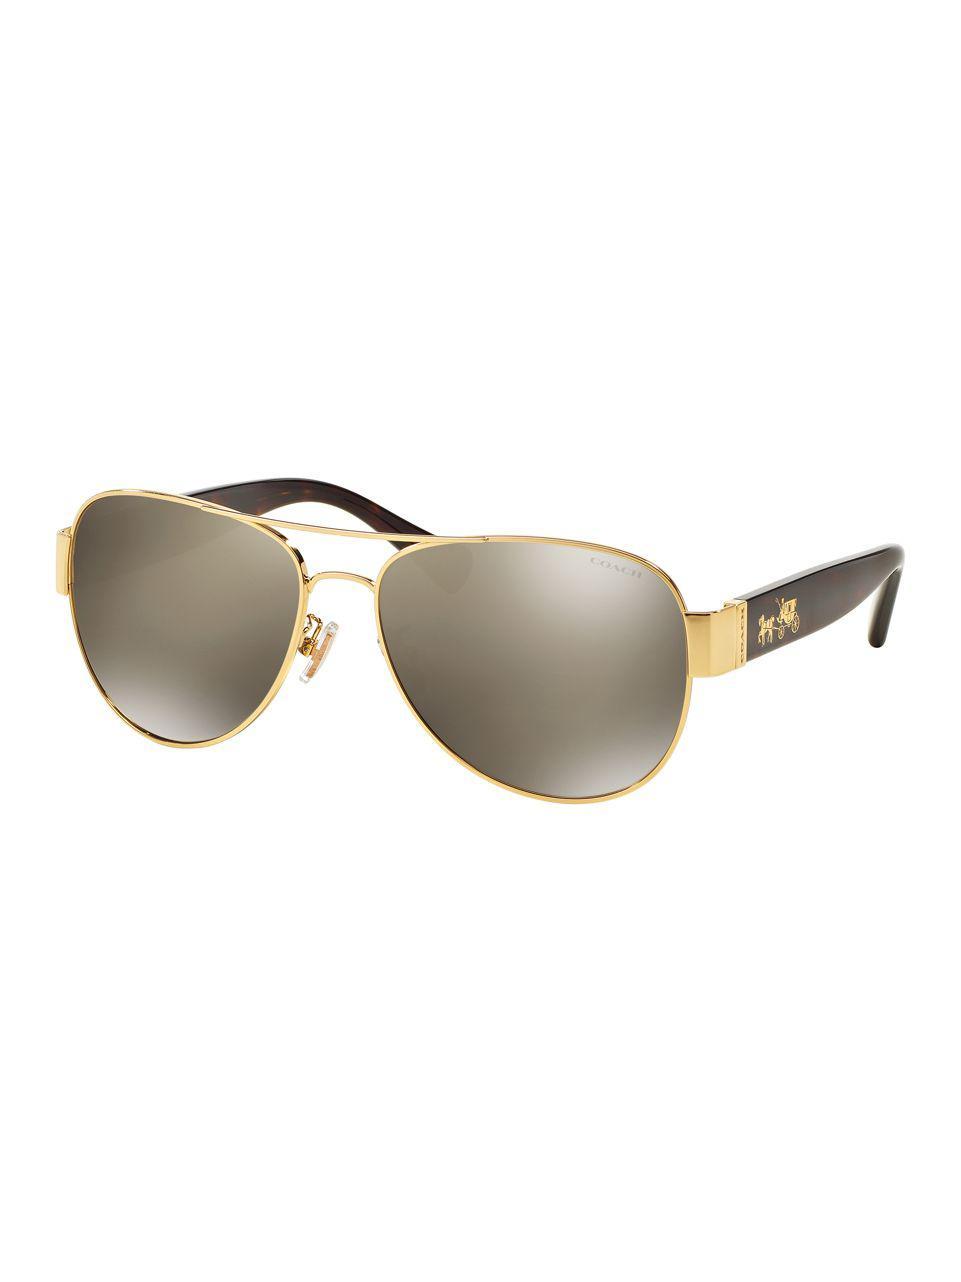 2bfd634d3a6 COACH - Metallic L138 58mm Aviator Sunglasses for Men - Lyst. View  fullscreen